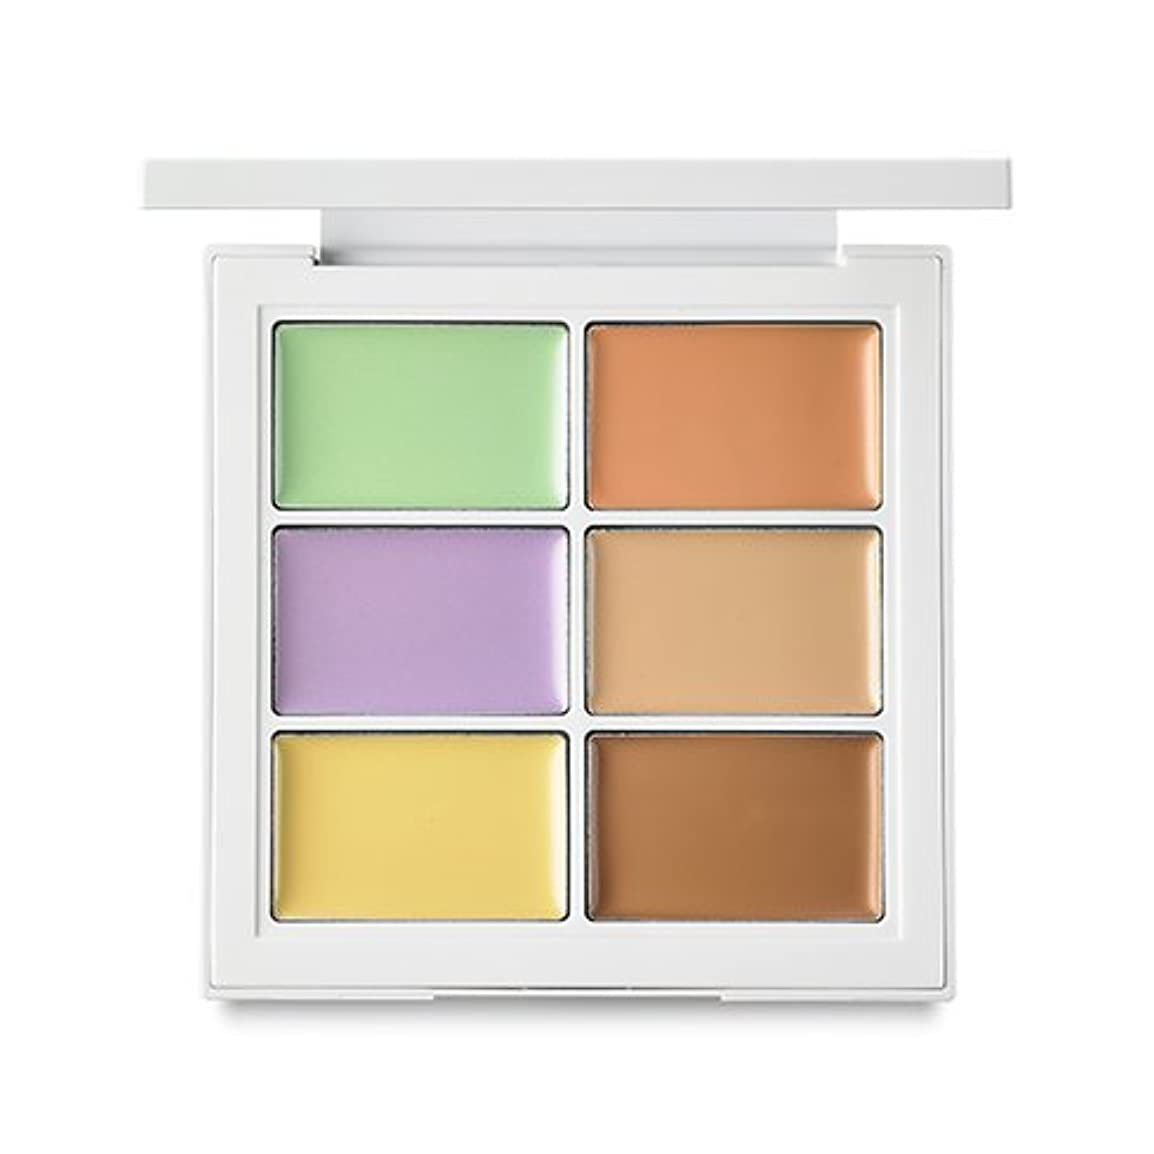 BANILA CO It Radiant CC Color Palette 8.5g/バニラコ イット ラディアント CC カラー パレット 8.5g (#Warm Tone) [並行輸入品]